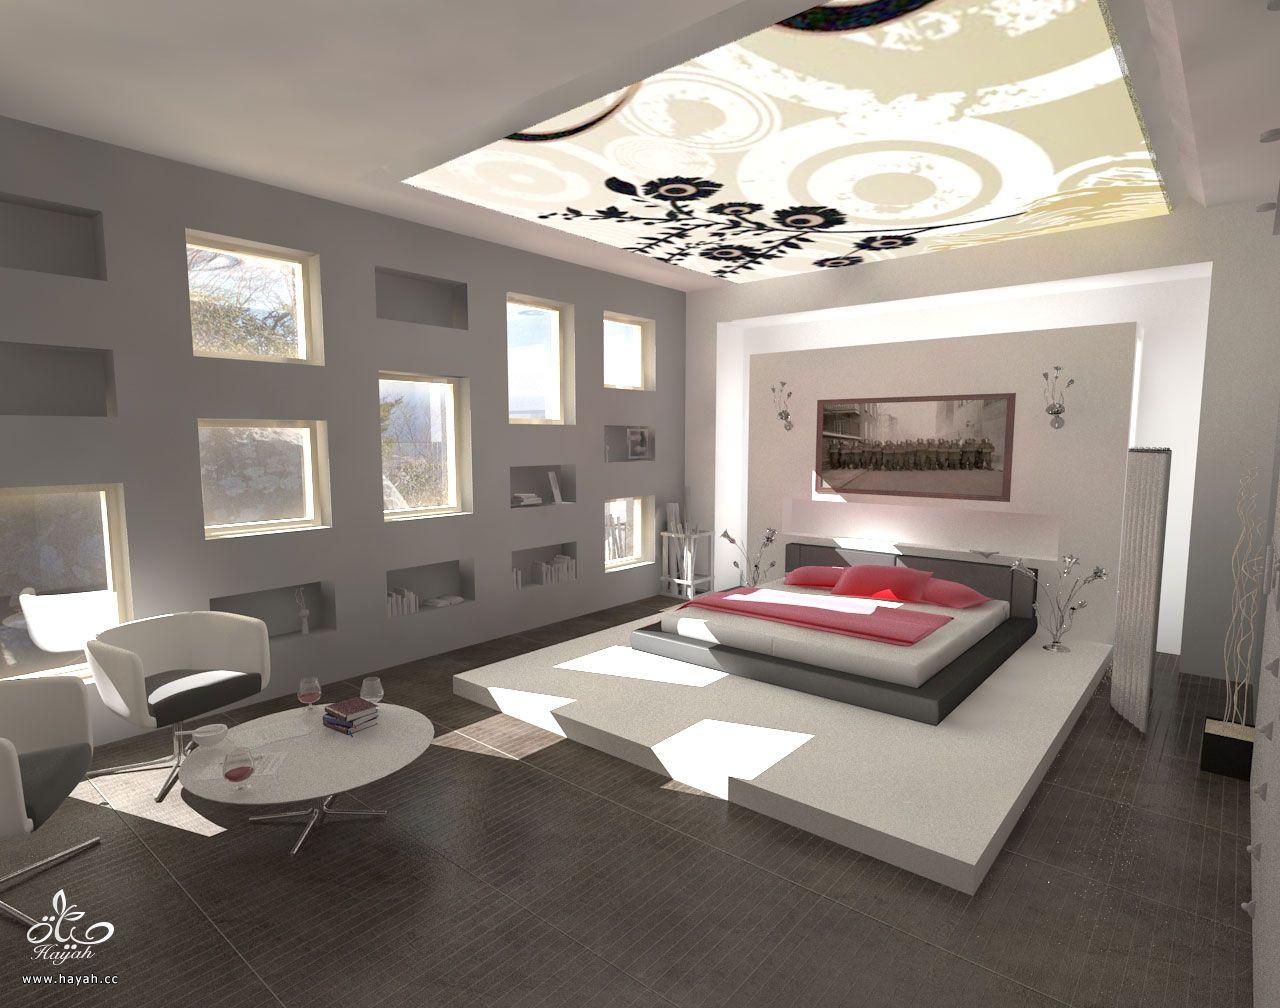 تصاميم غرف نوم ولا اجمل hayahcc_1367529966_312.jpg